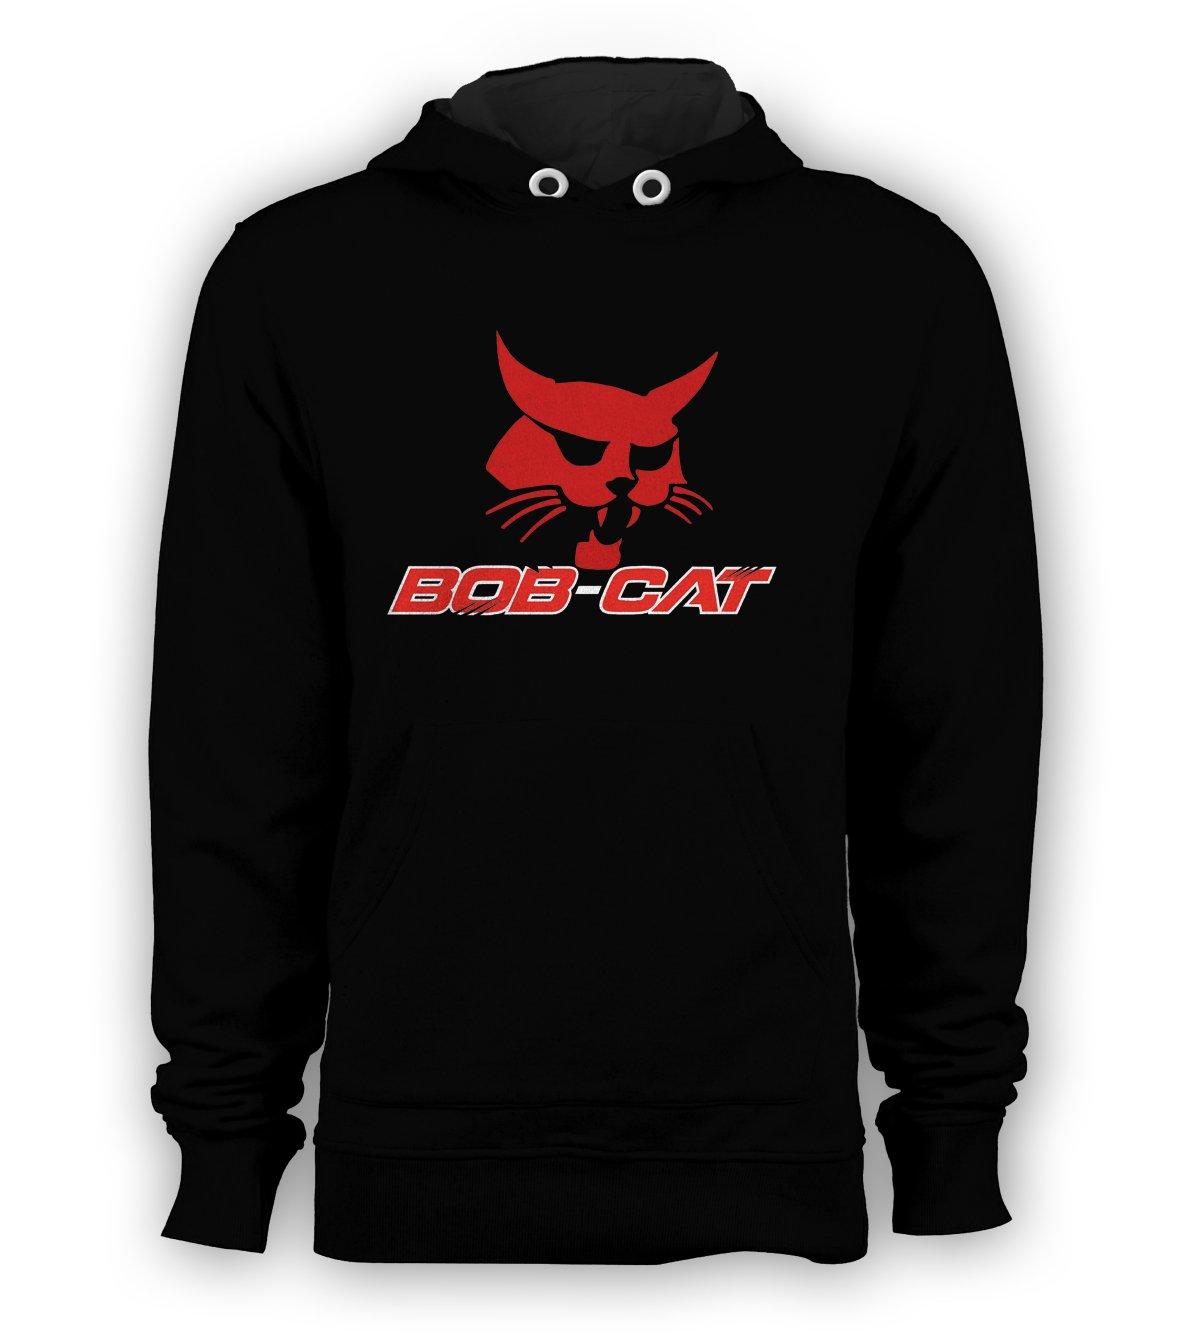 Bobcat Pullover Hoodie Men Sweatshirts Size S to 3XL New Black